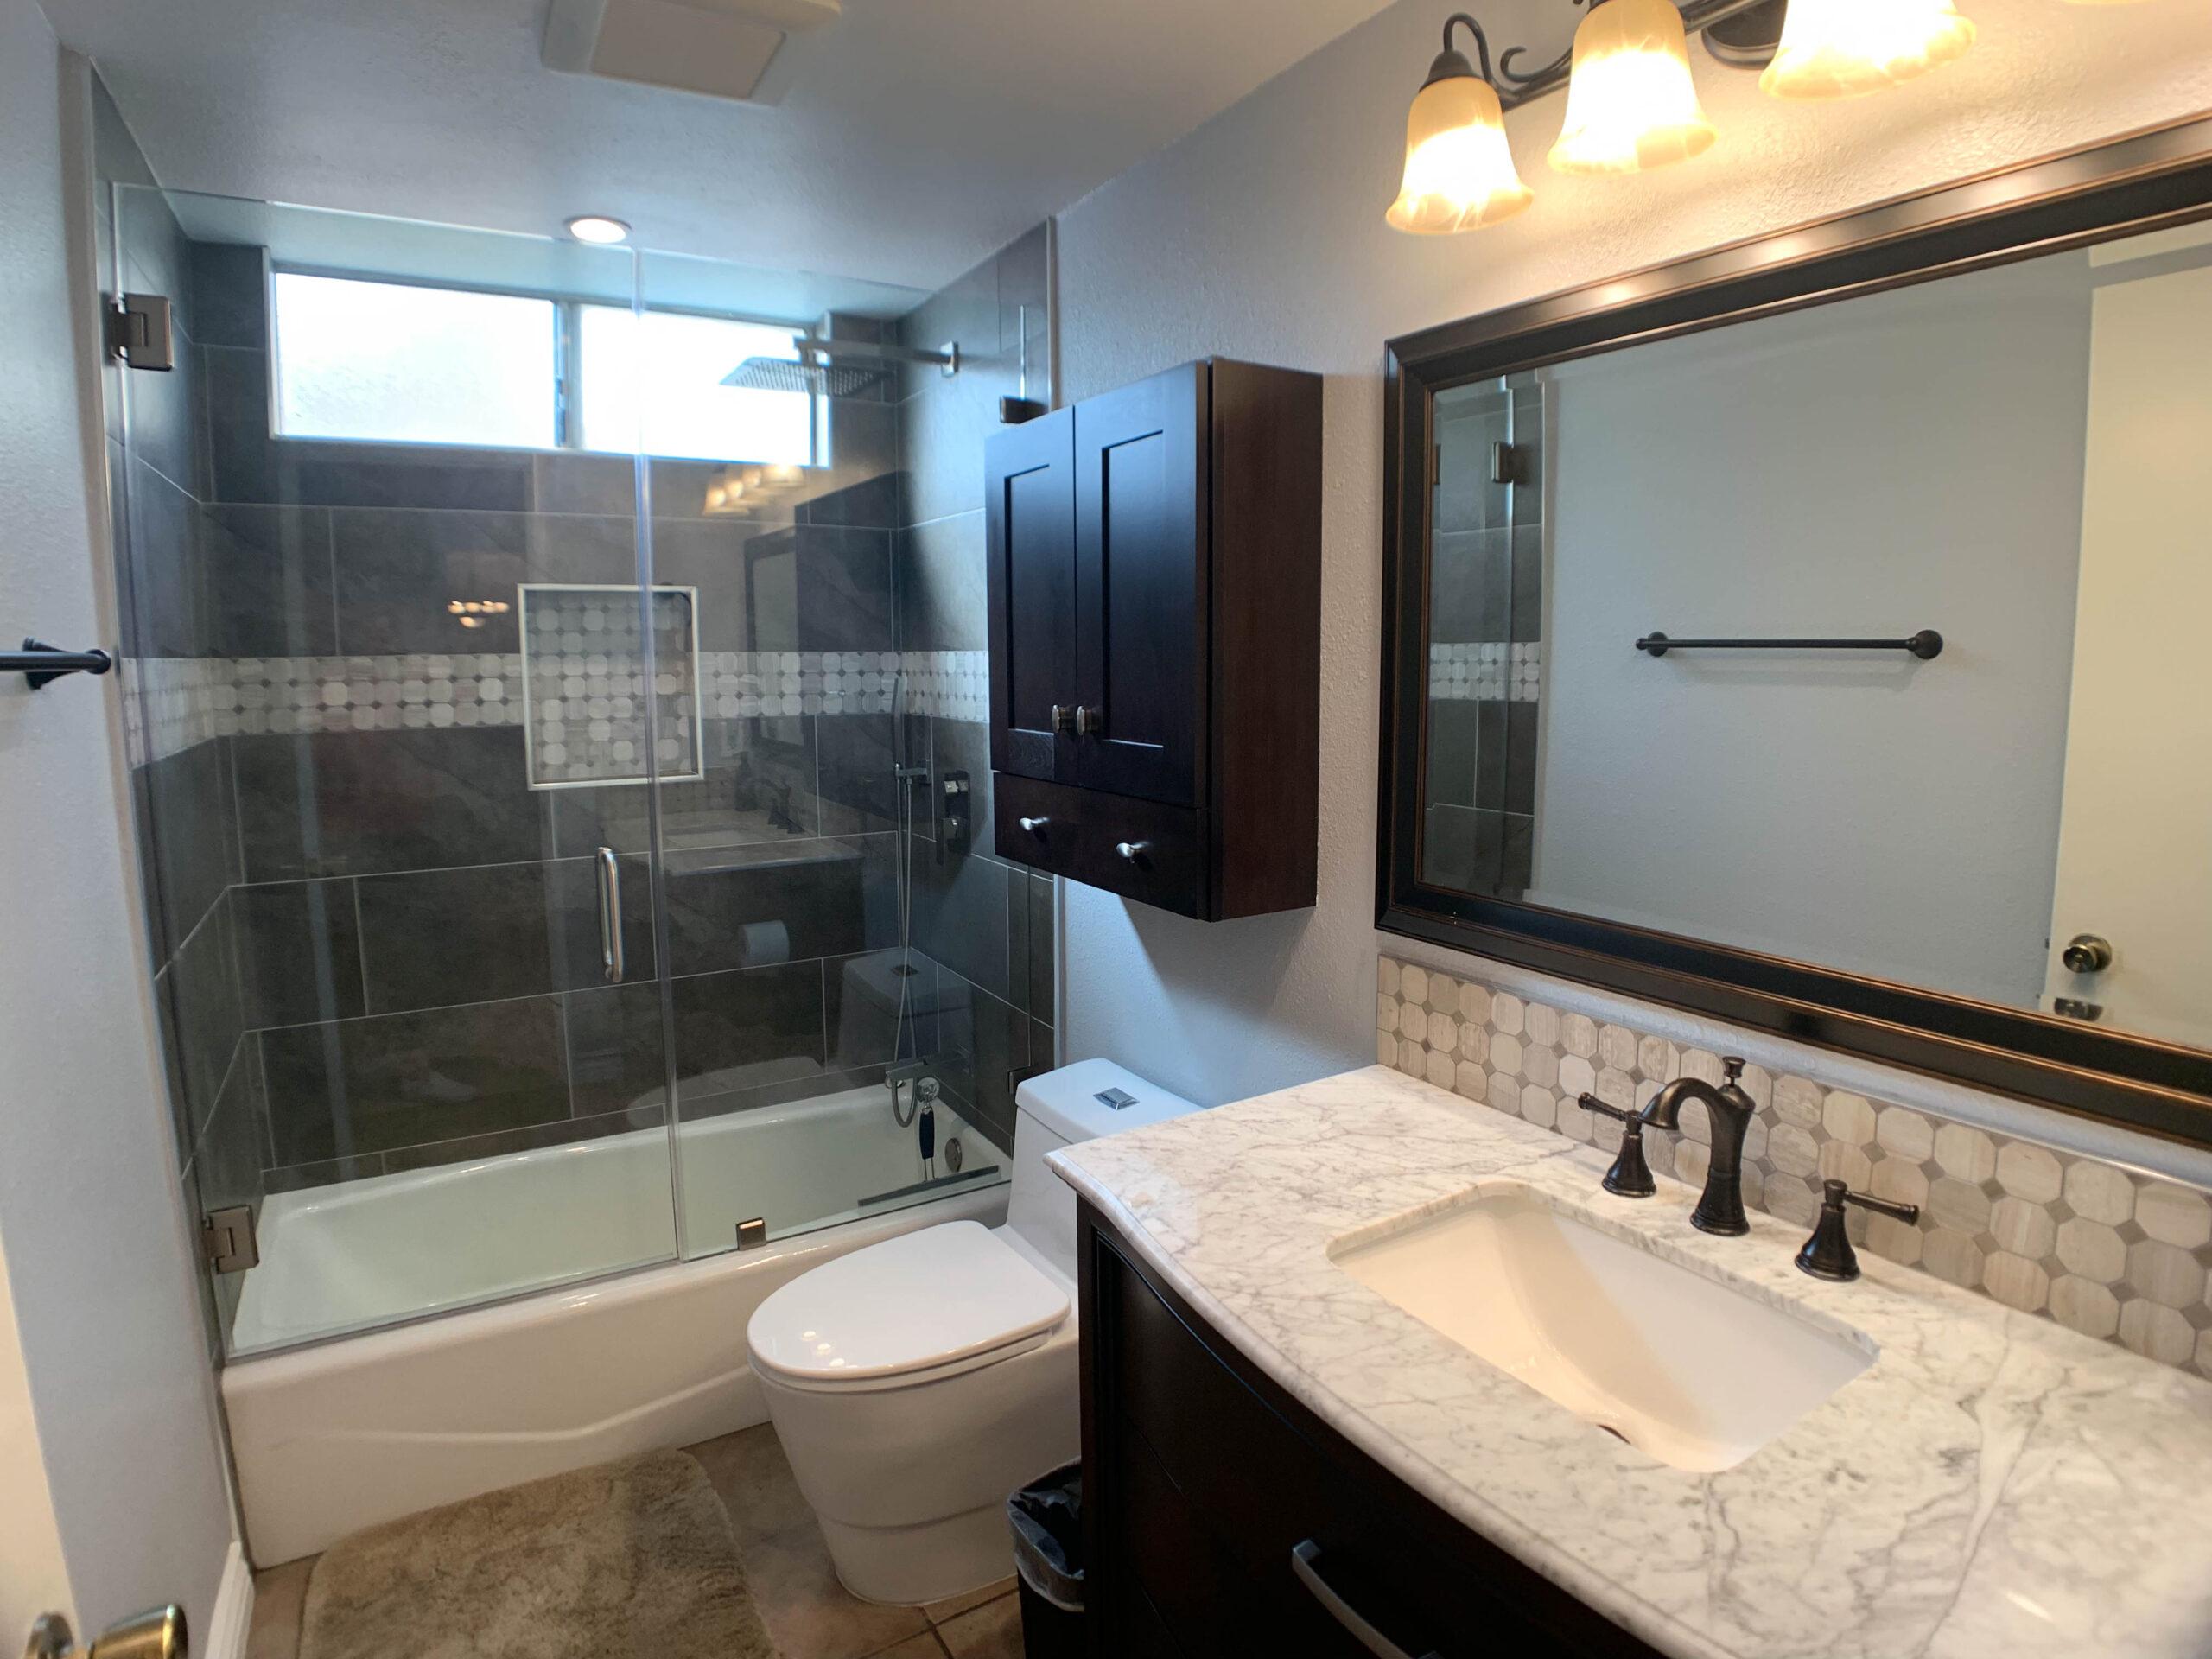 Bathrooms Remodels in Simi Valley CA